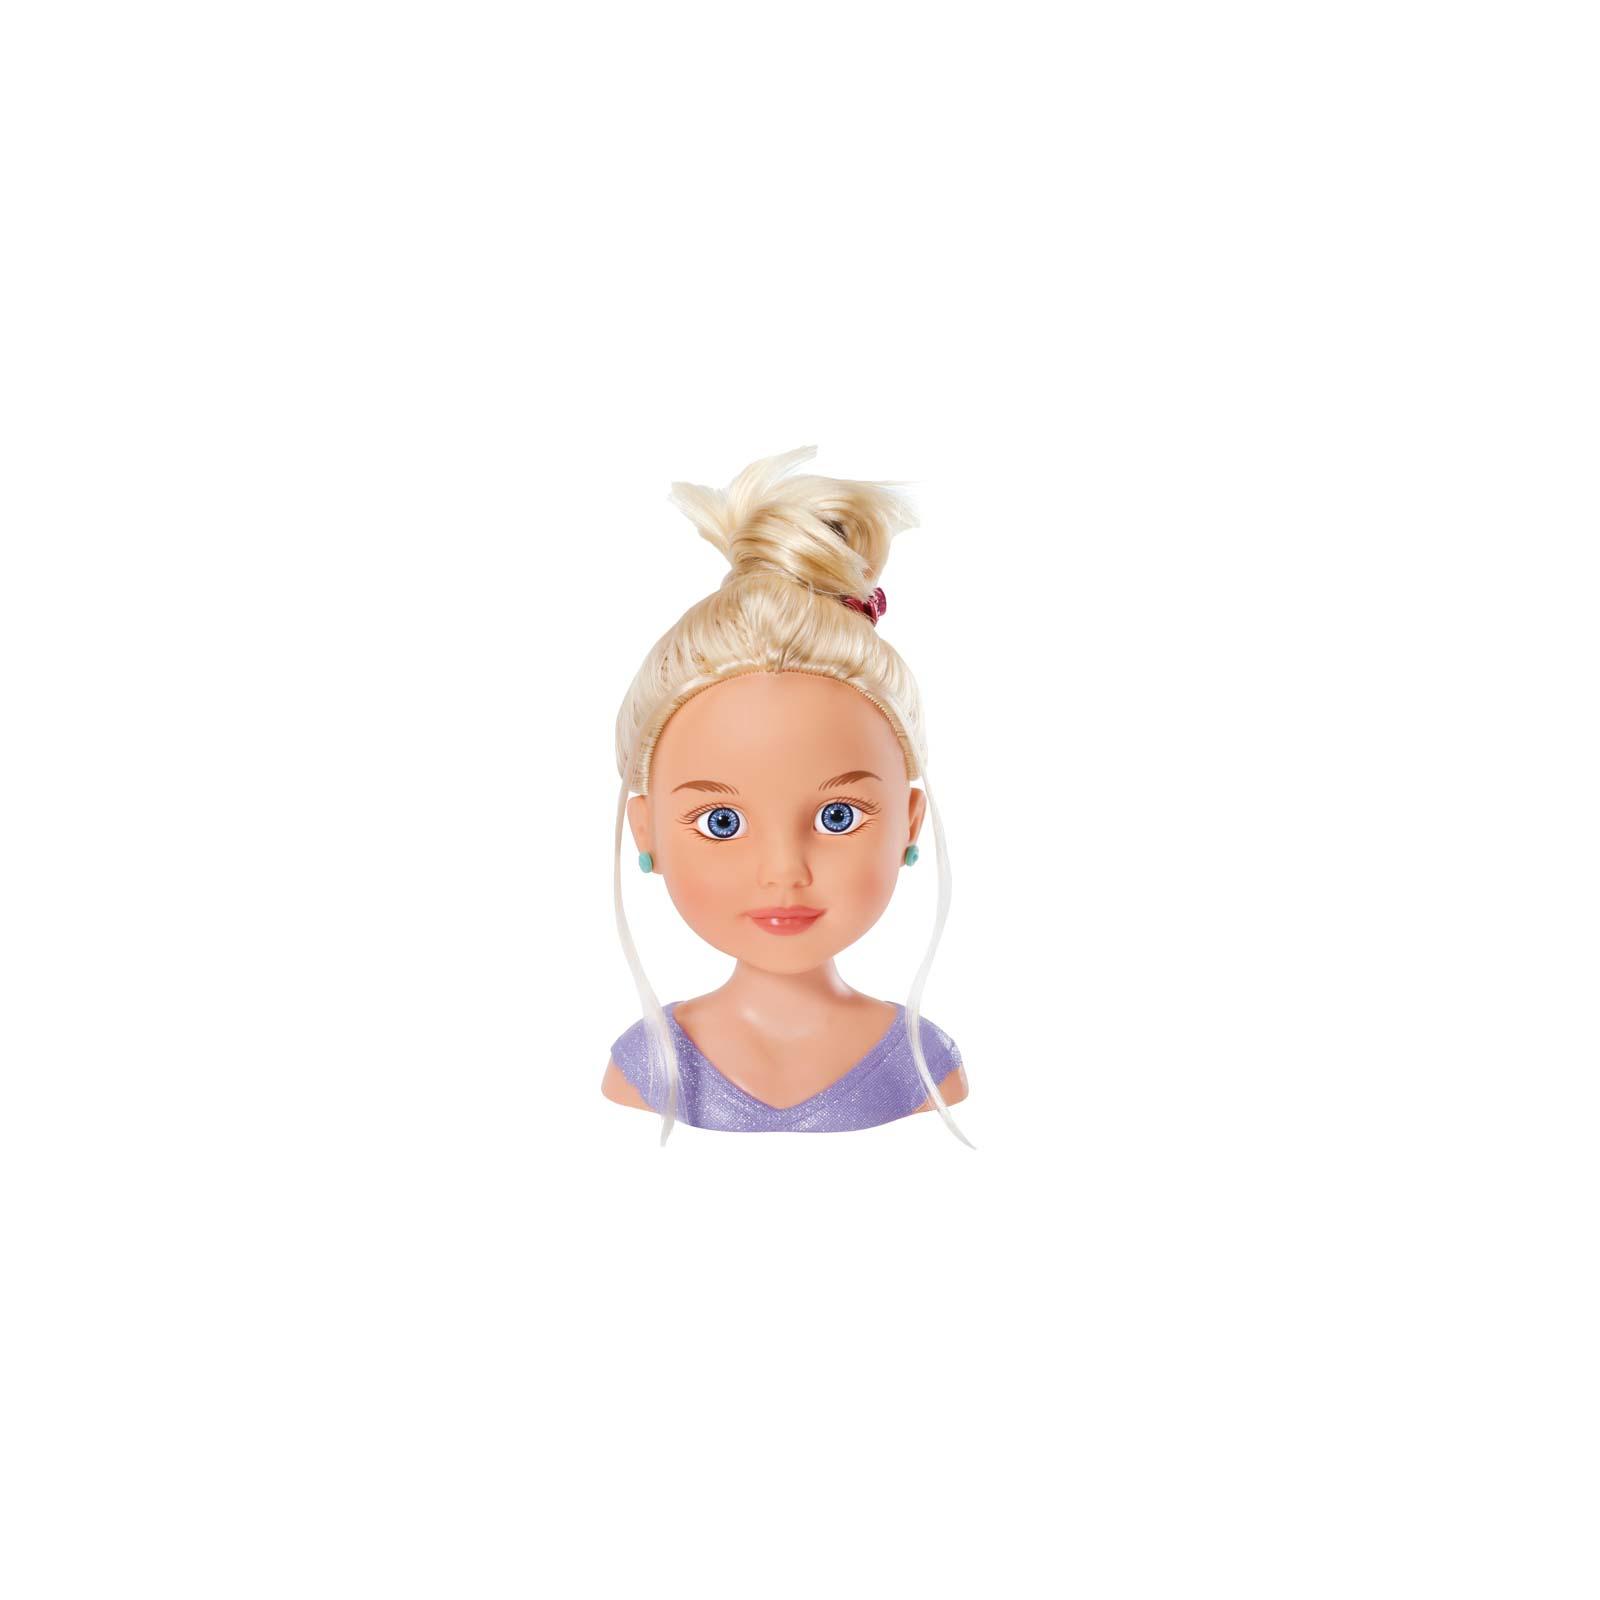 Кукла Zapf Манекен My Model Визажист (951576) изображение 4